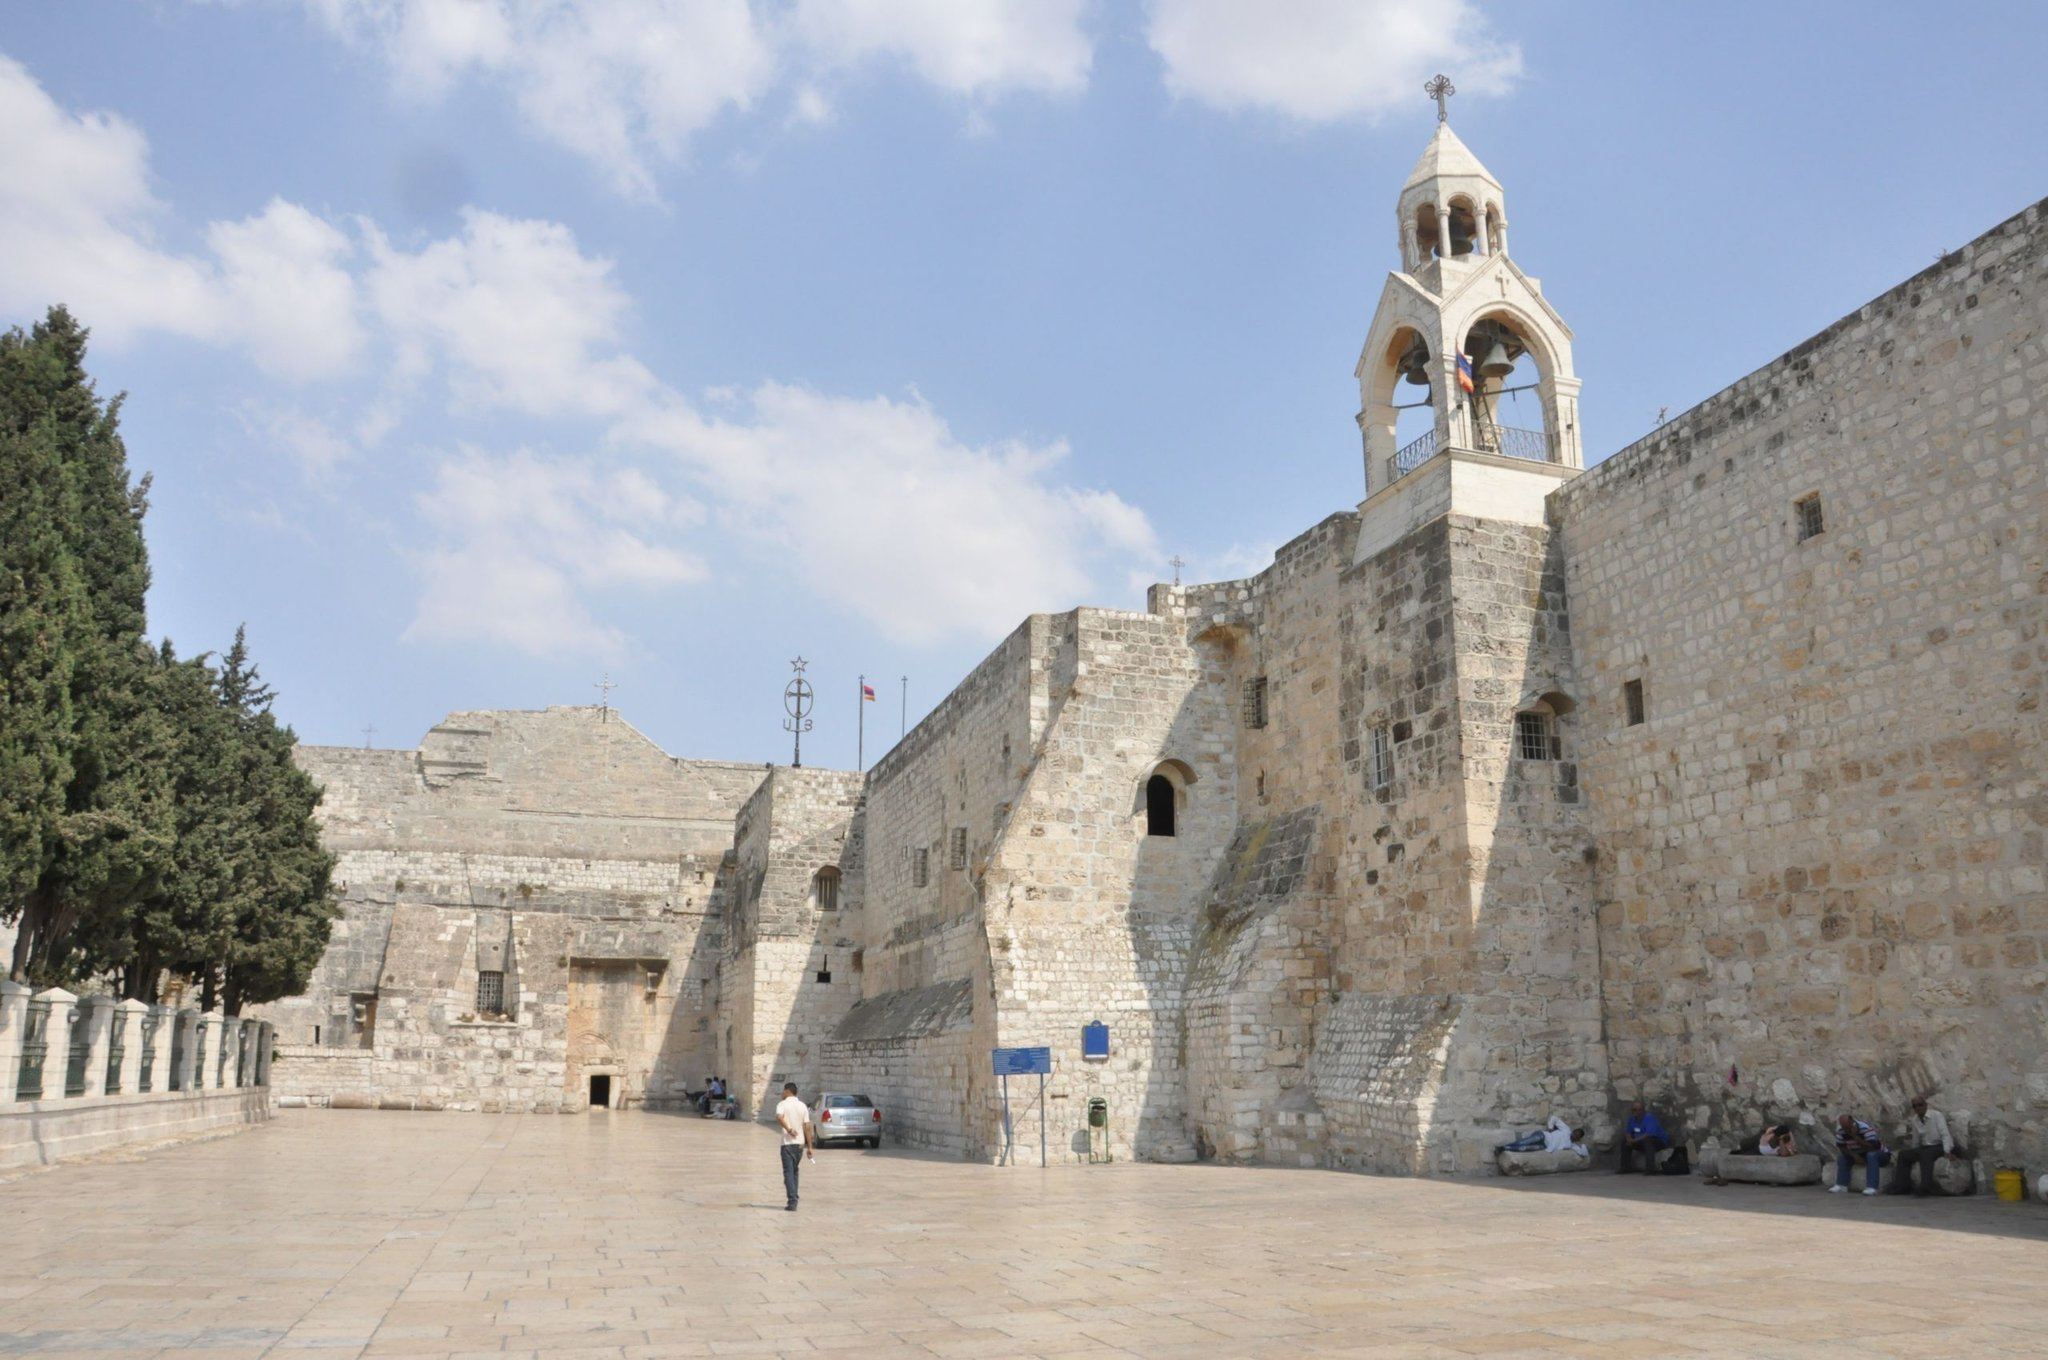 Вице-президент США отложил визит вИзраиль